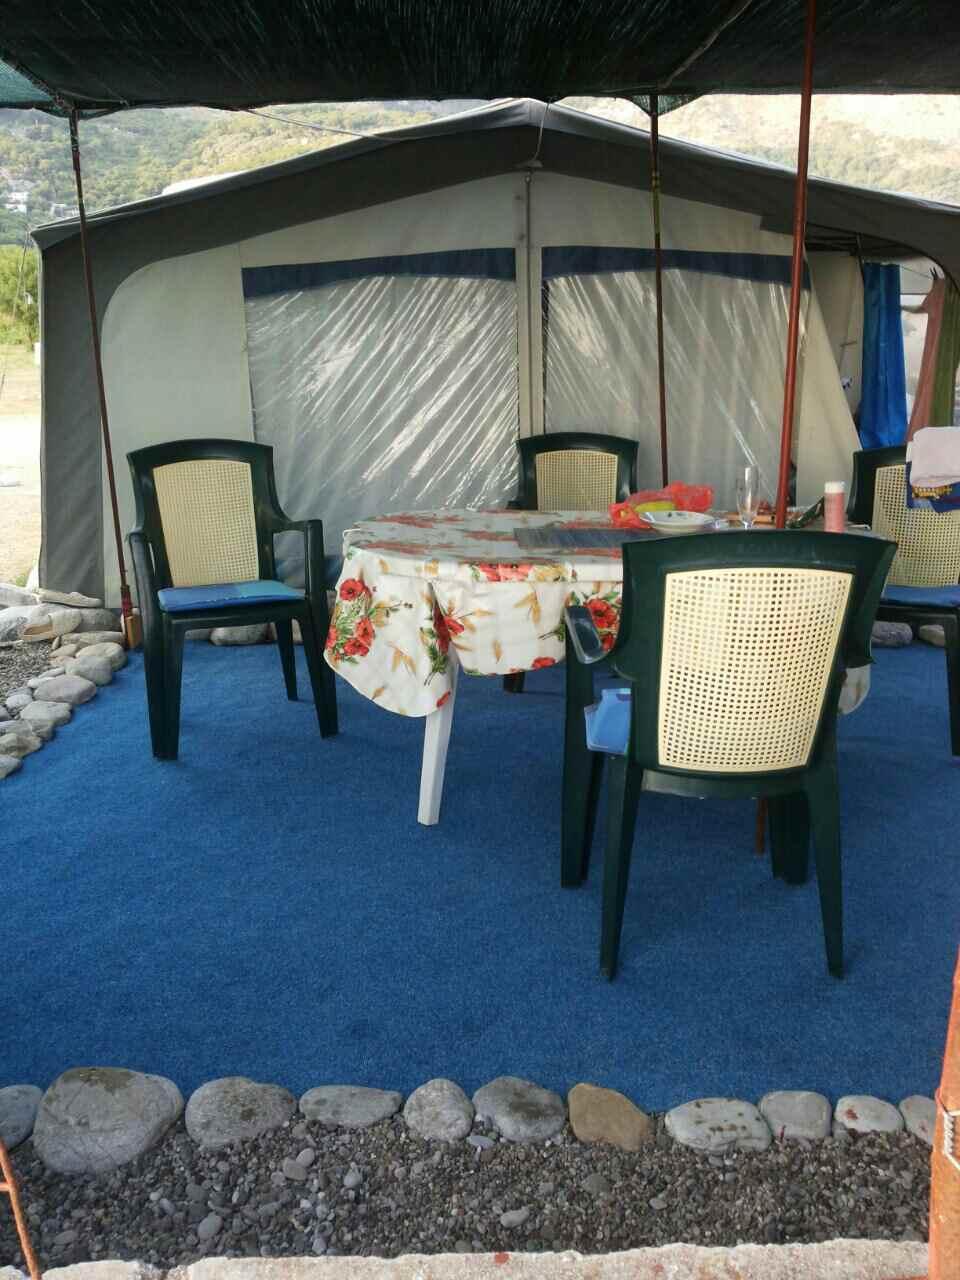 Letovanje - Crna Gora - Izdavanje kamp prikolice u Buljarici